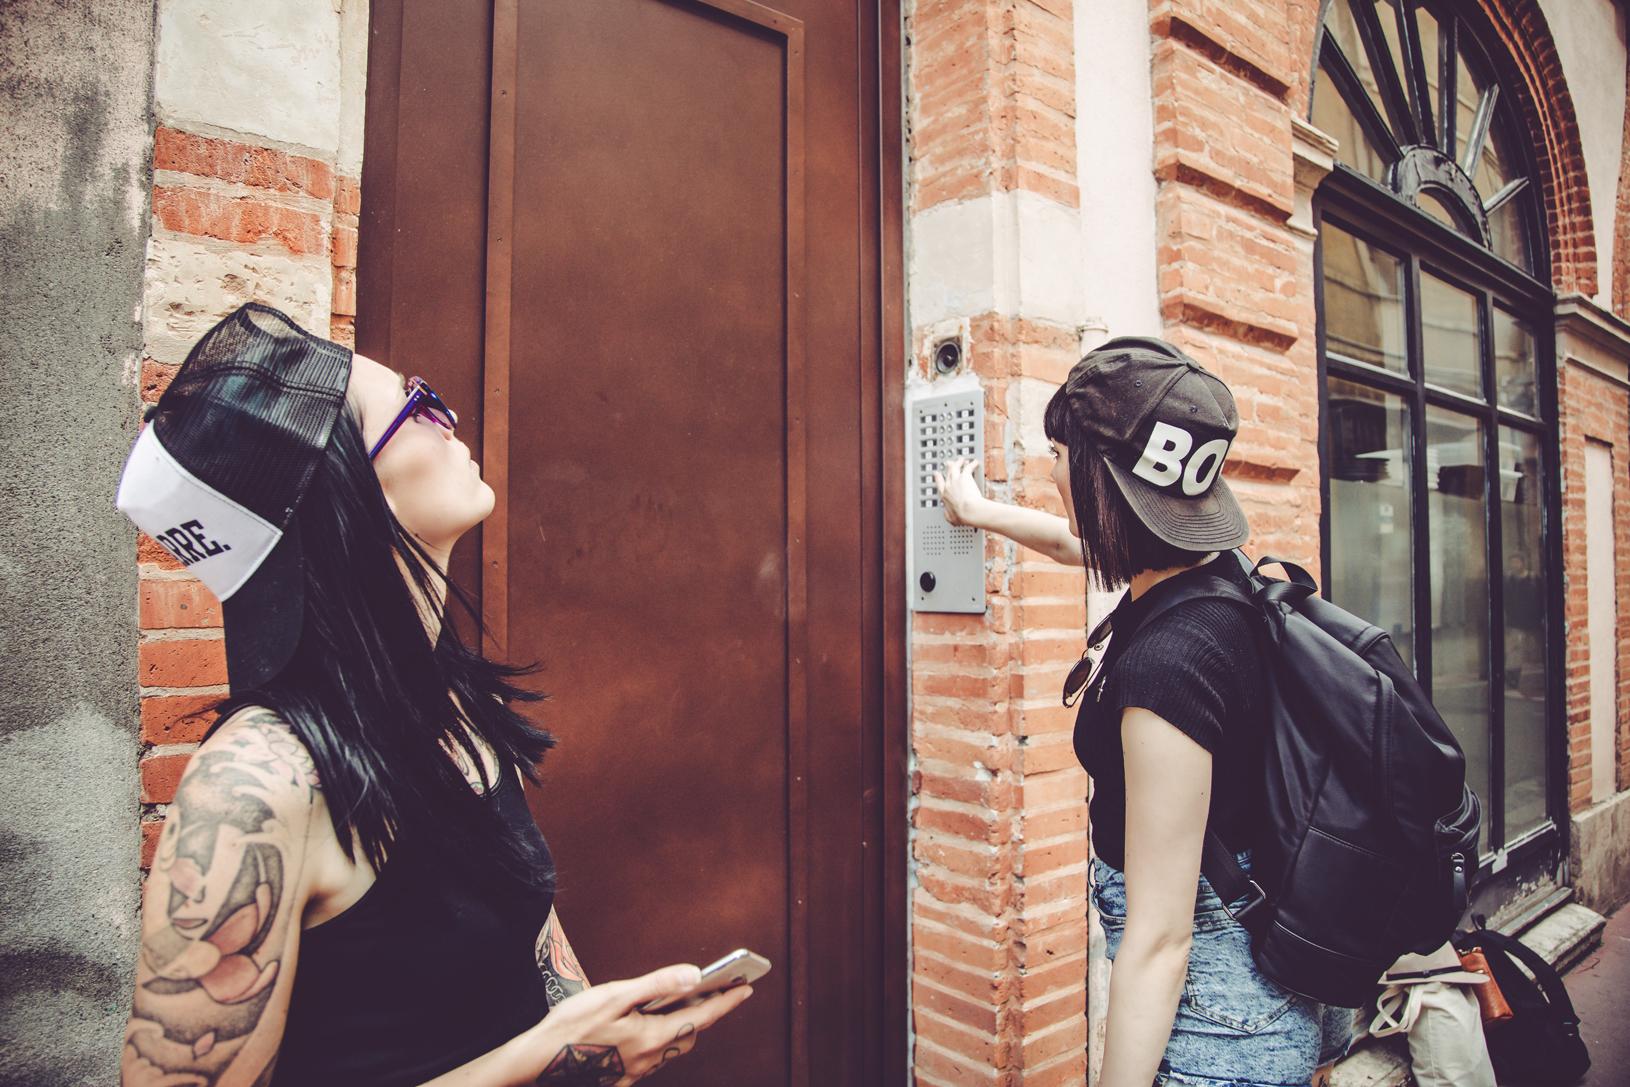 Two women ring a doorbell in an older looking urban neighborhood.